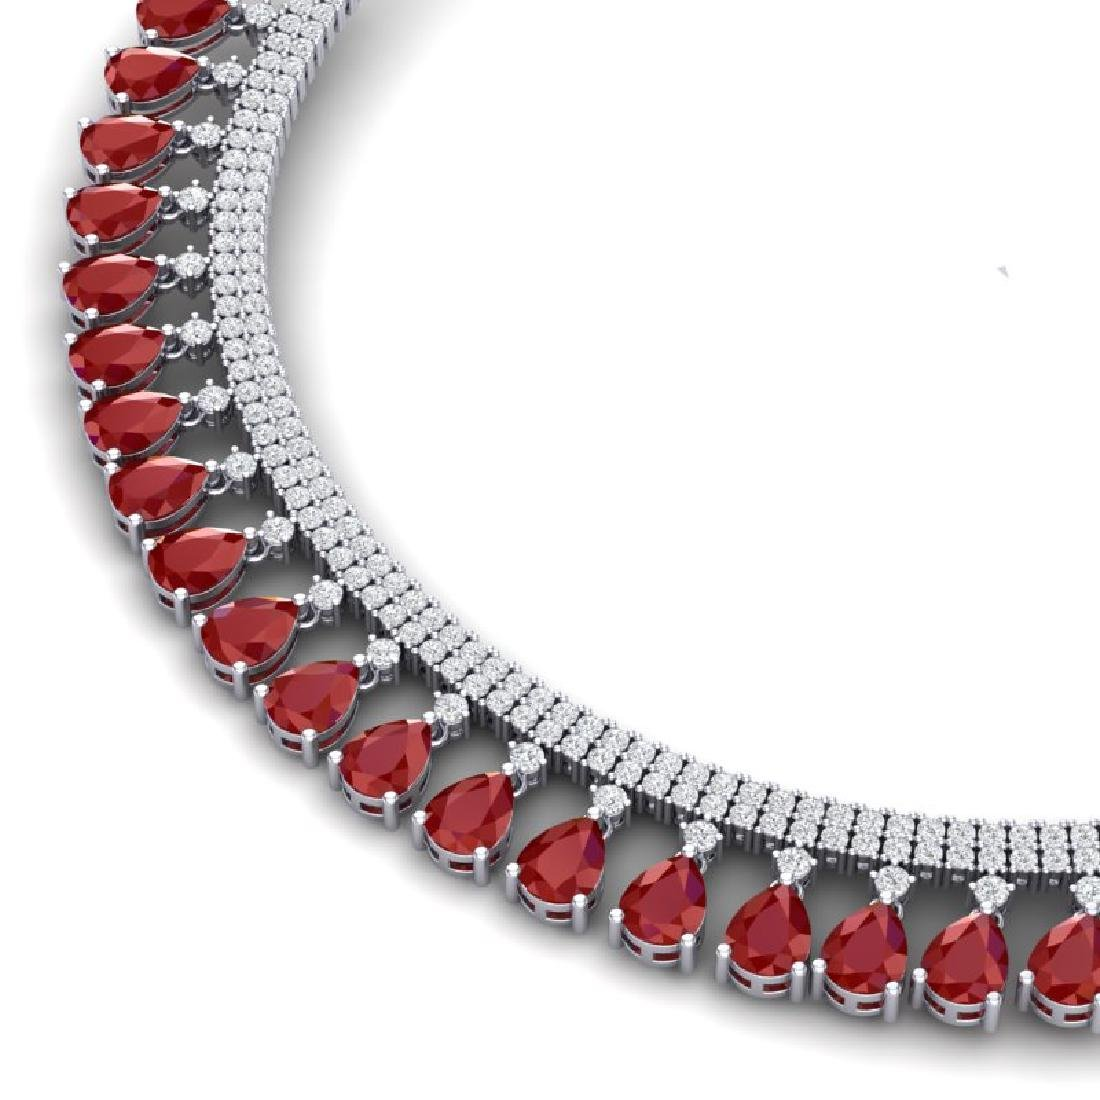 51.75 CTW Royalty Ruby & VS Diamond Necklace 18K White - 2